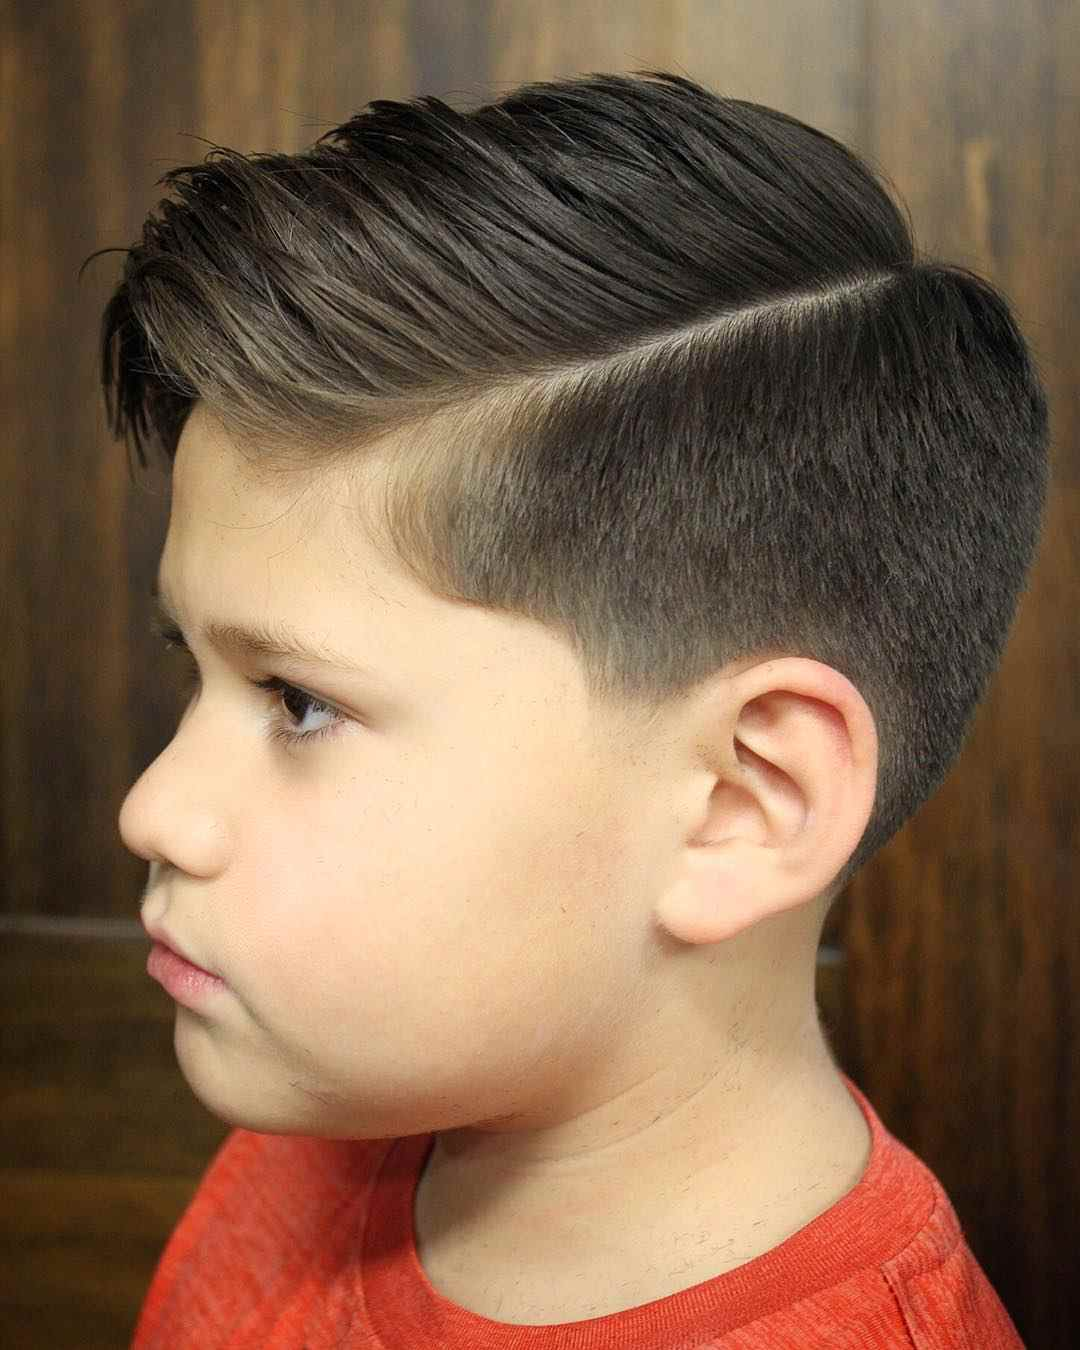 Kinder Jungen Haarschnitt Undercut